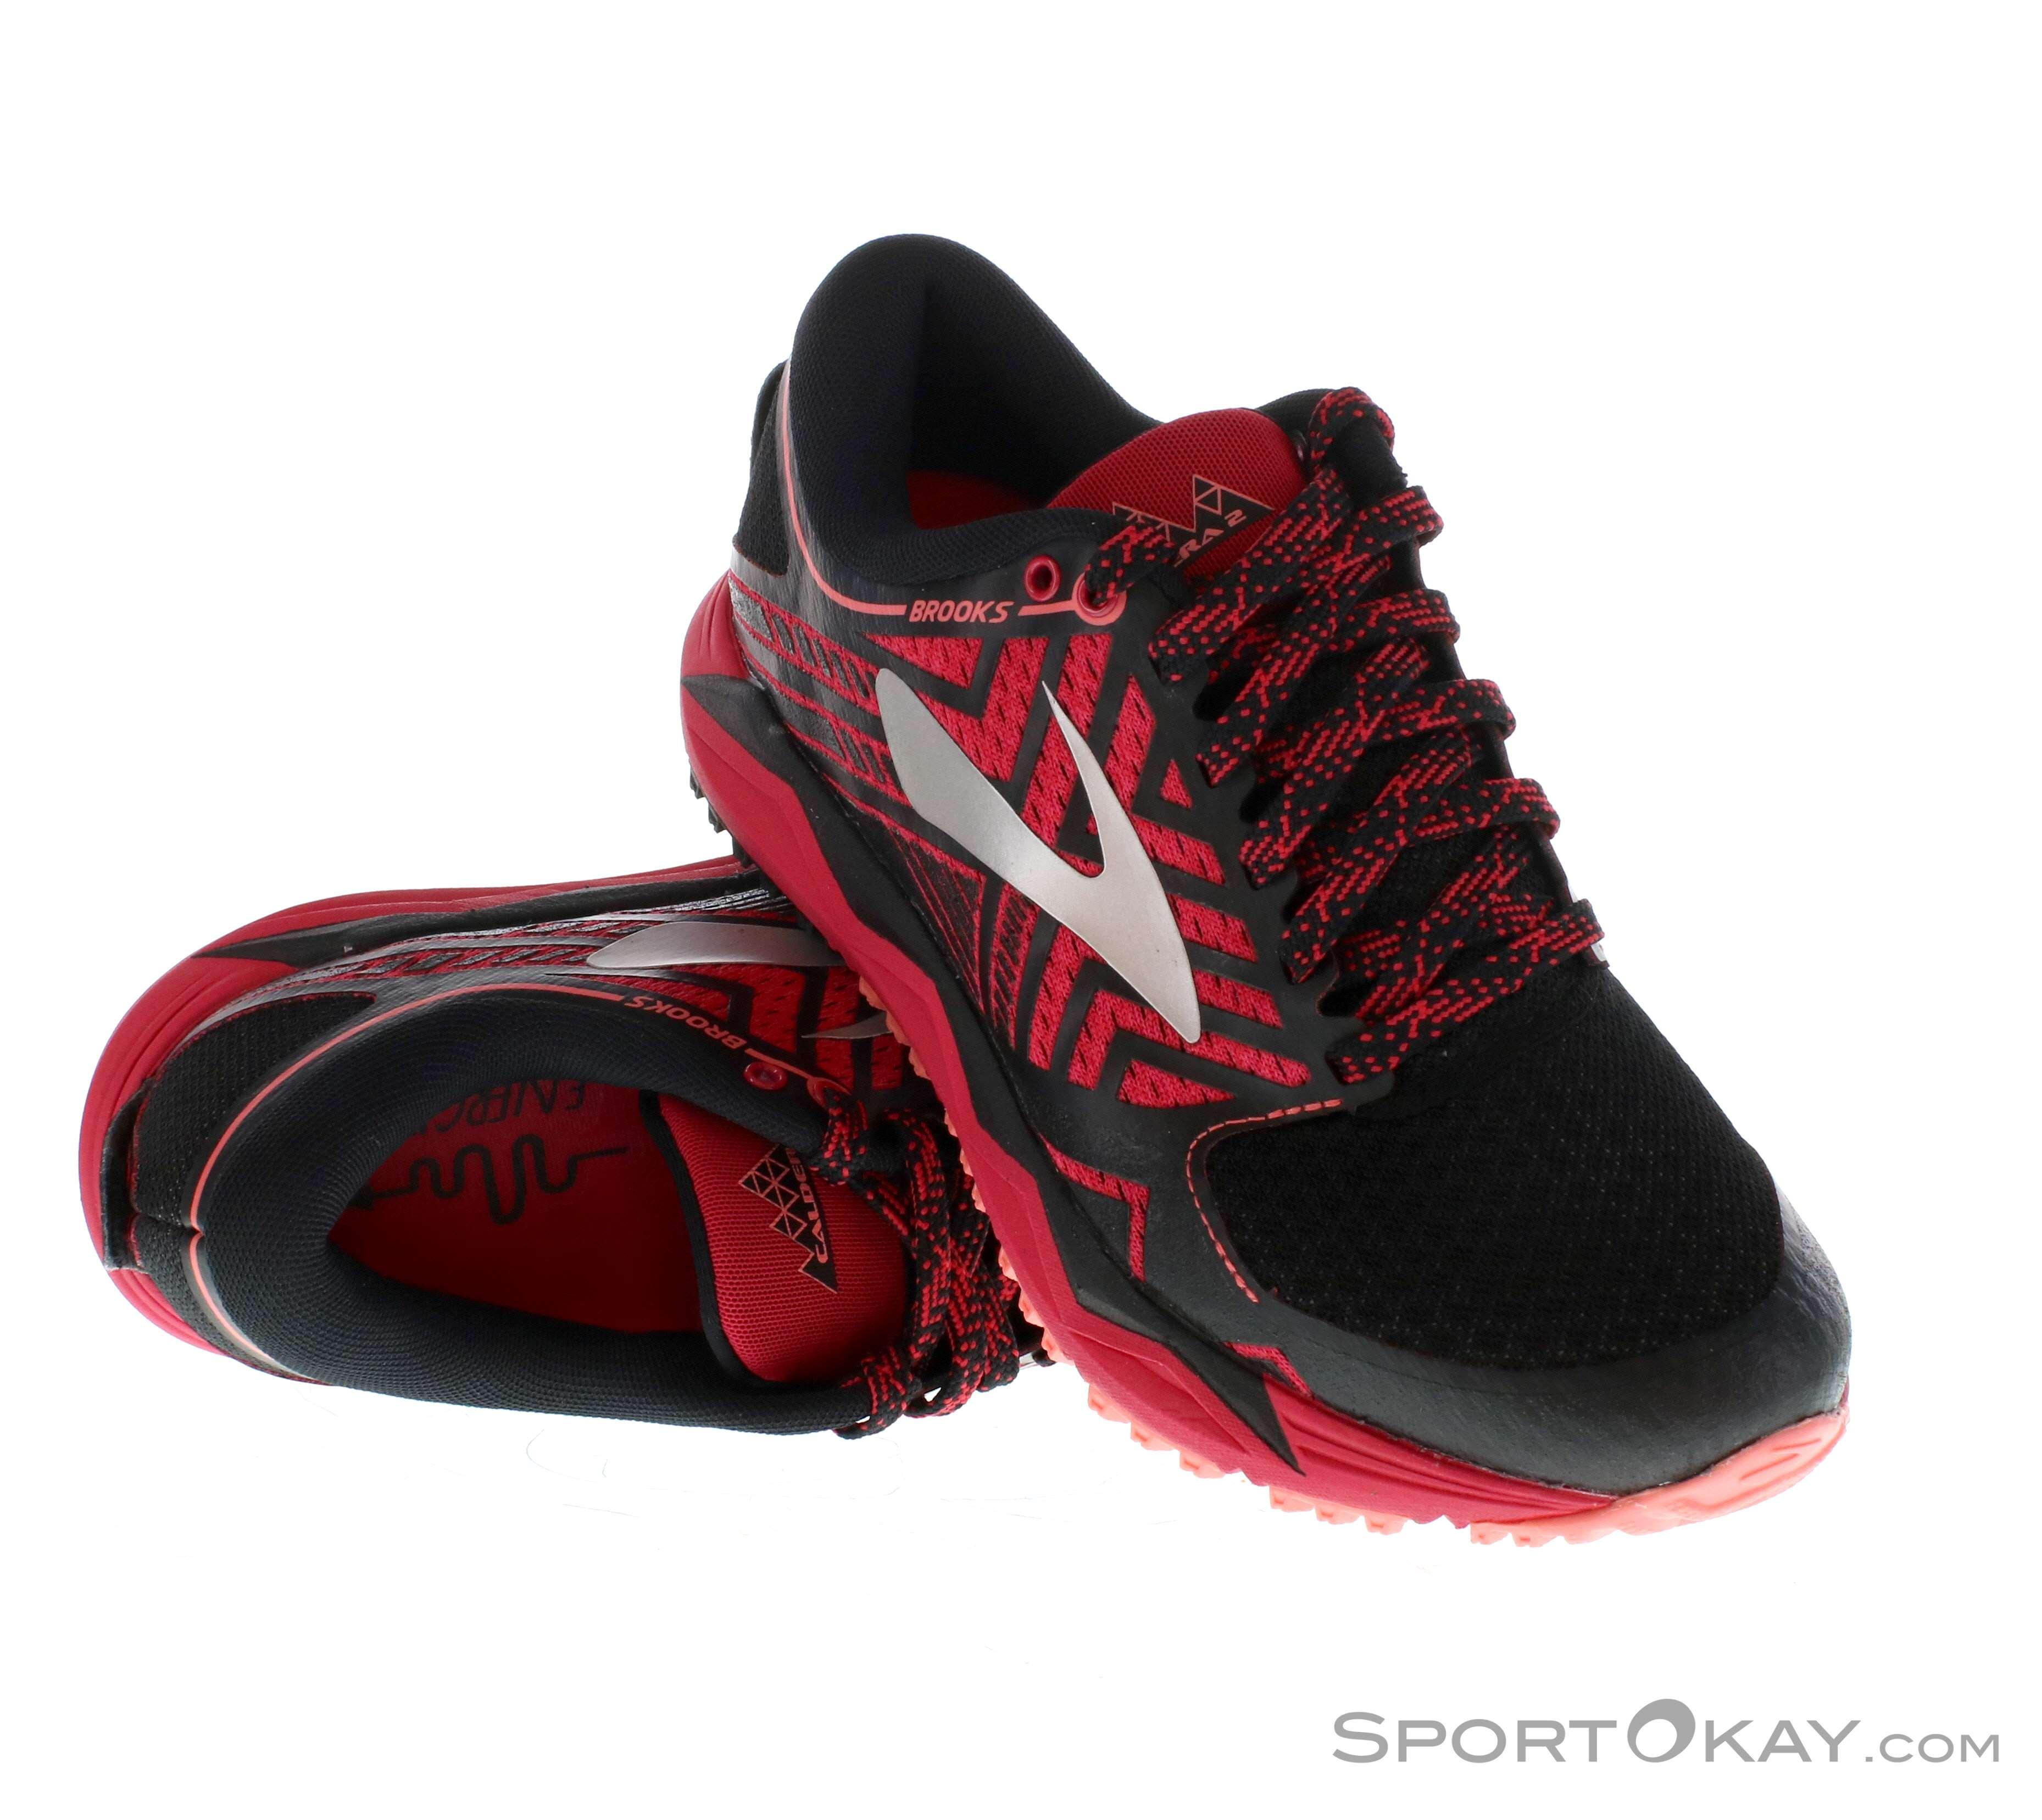 Brooks Caldera 2 Womens Running Shoes